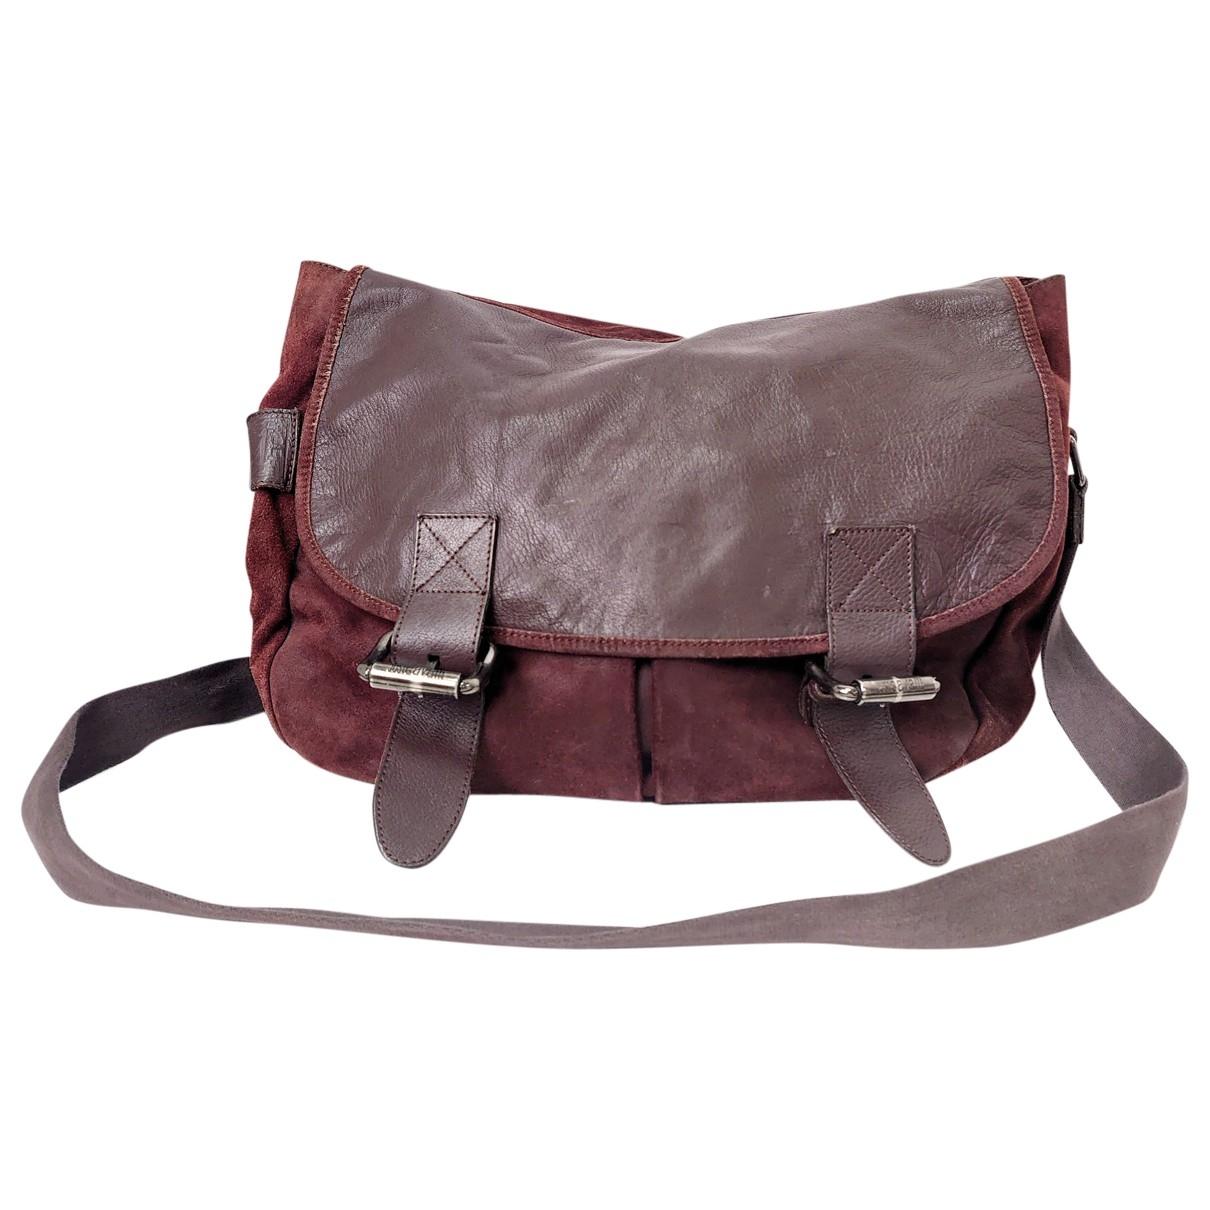 Just Cavalli \N Leather bag for Men \N